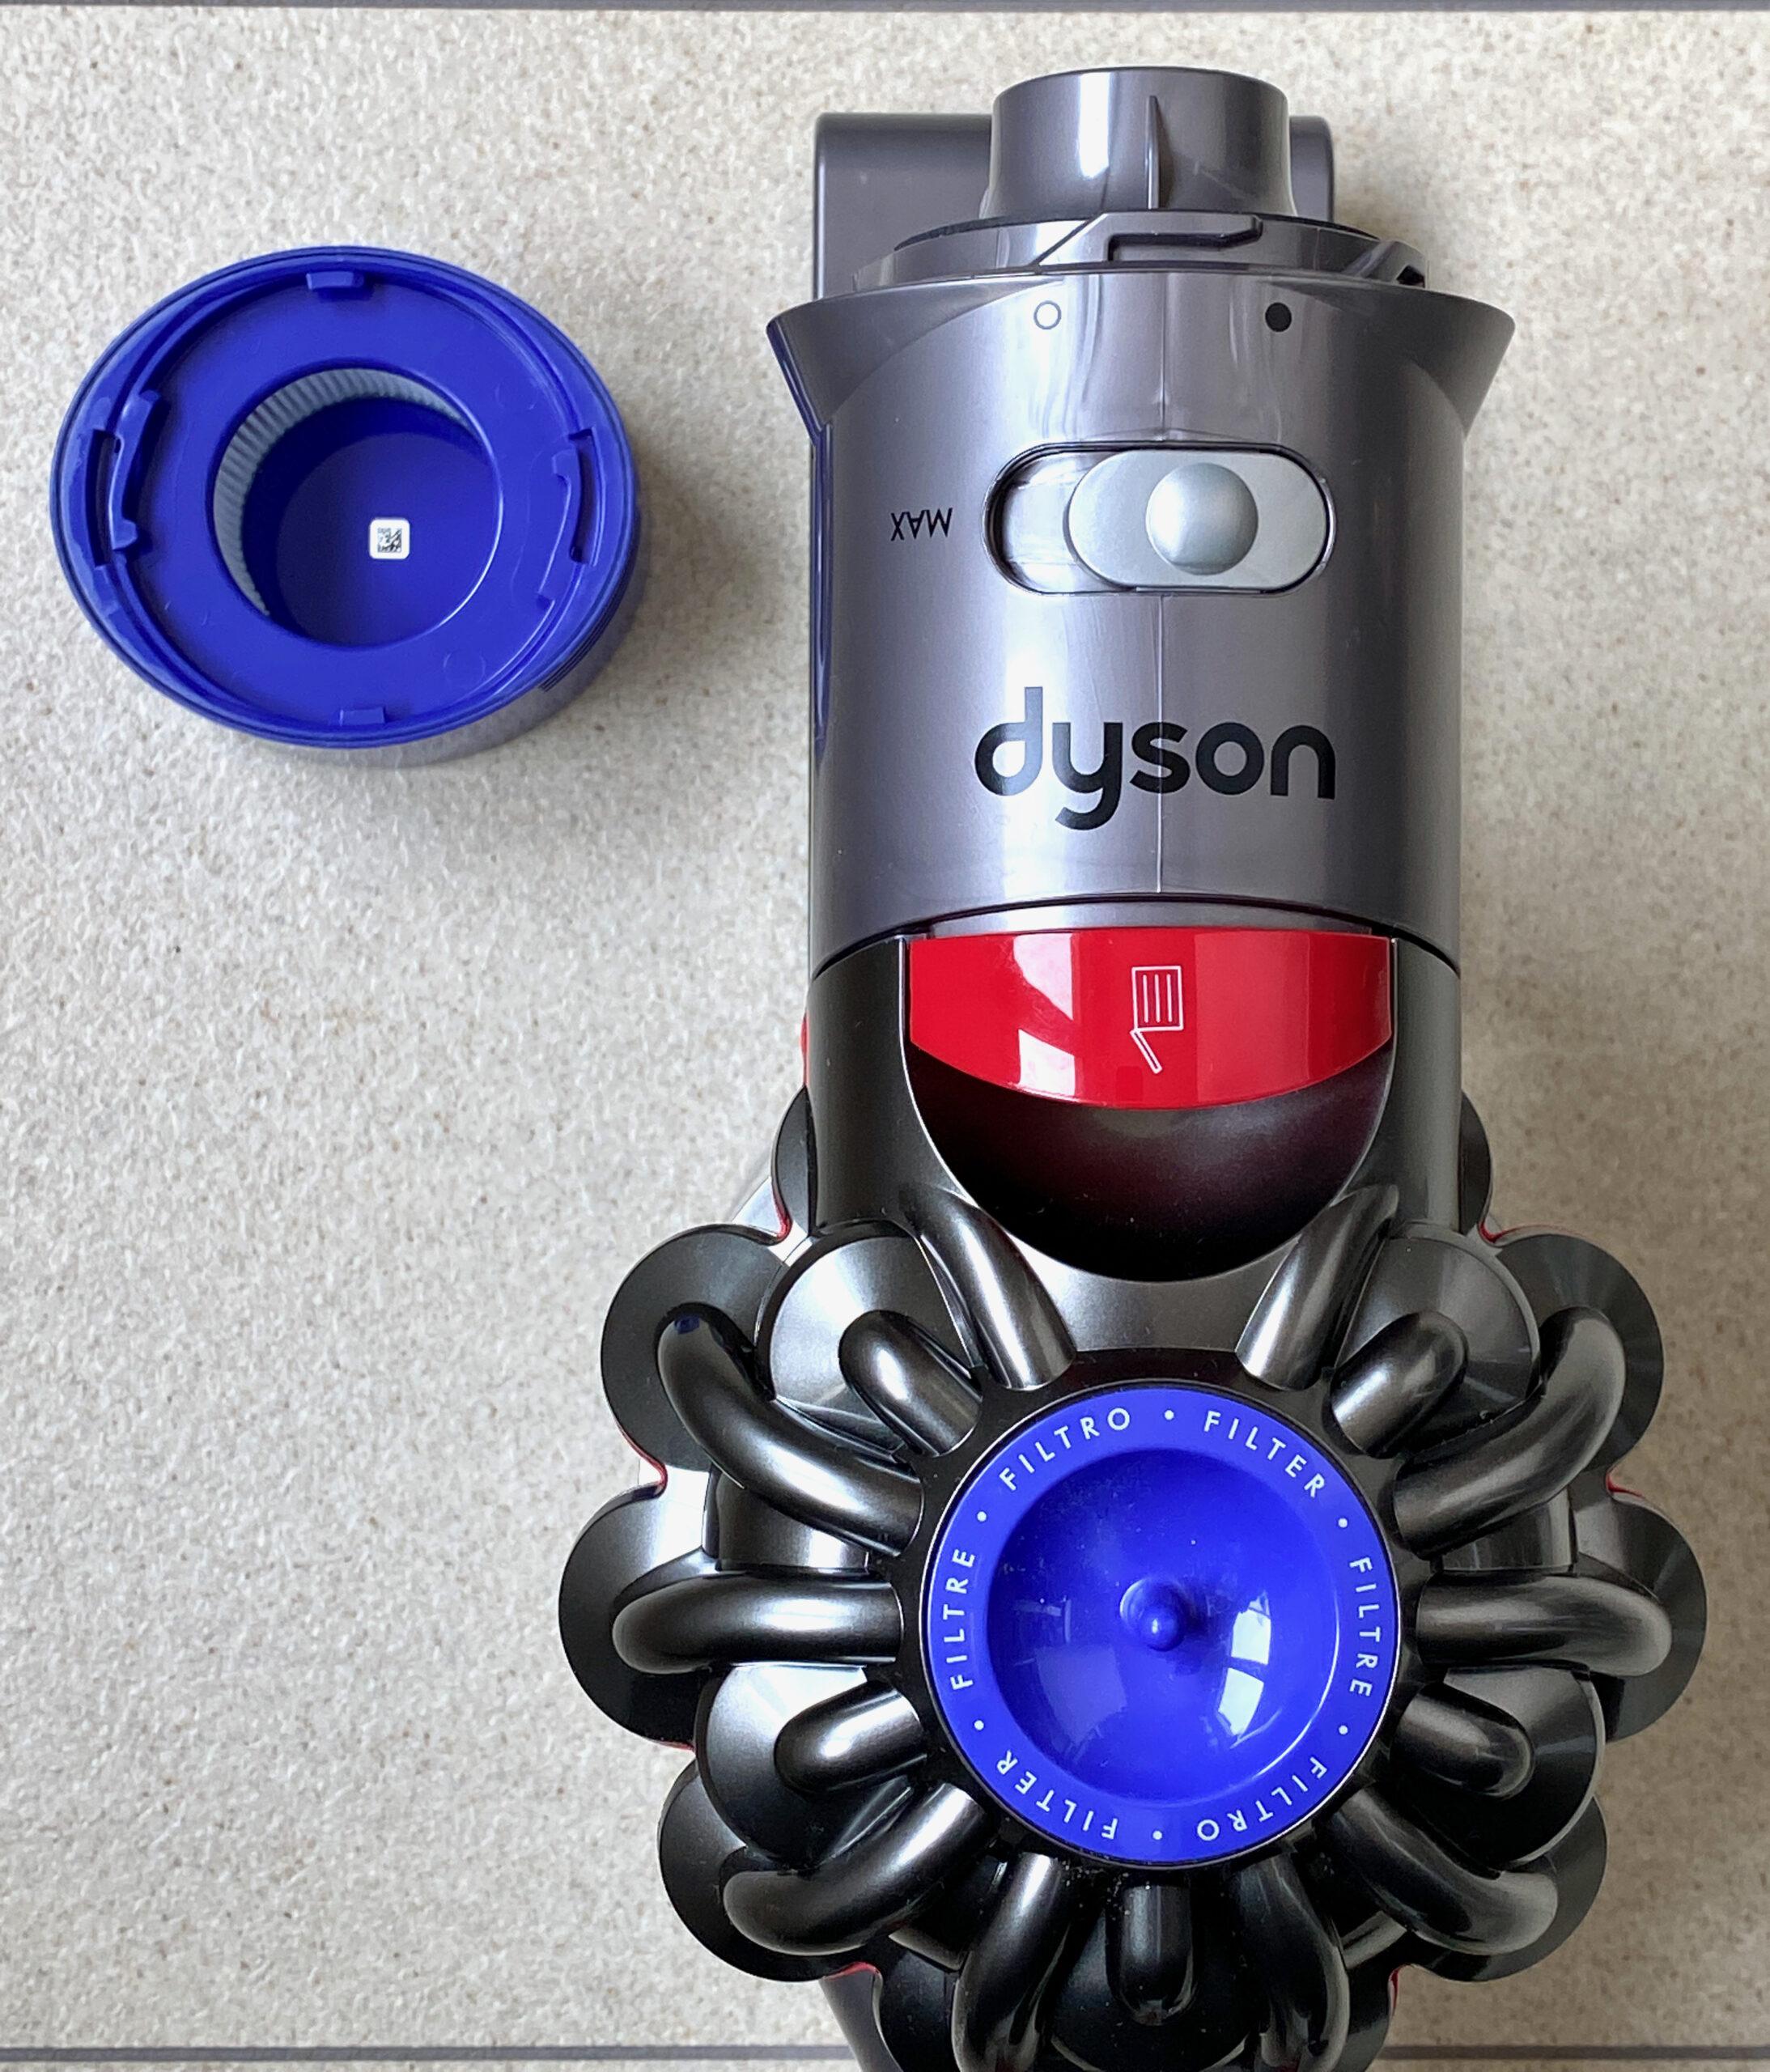 Luftfilter am Akkustaubsauger des Dyson v8